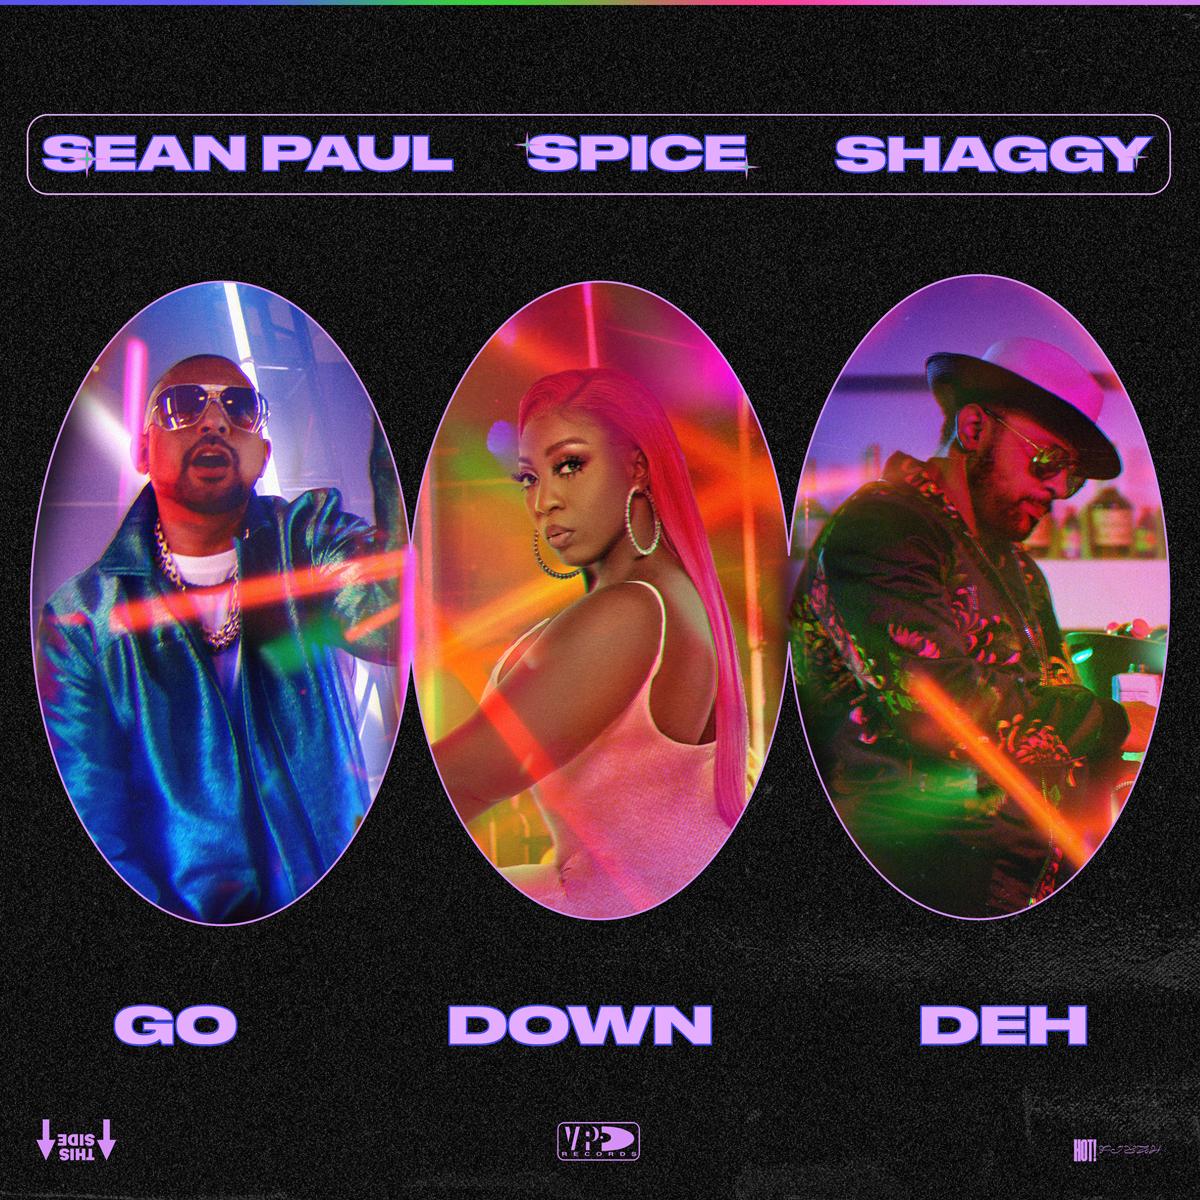 Go Down Deh (Digital Release)